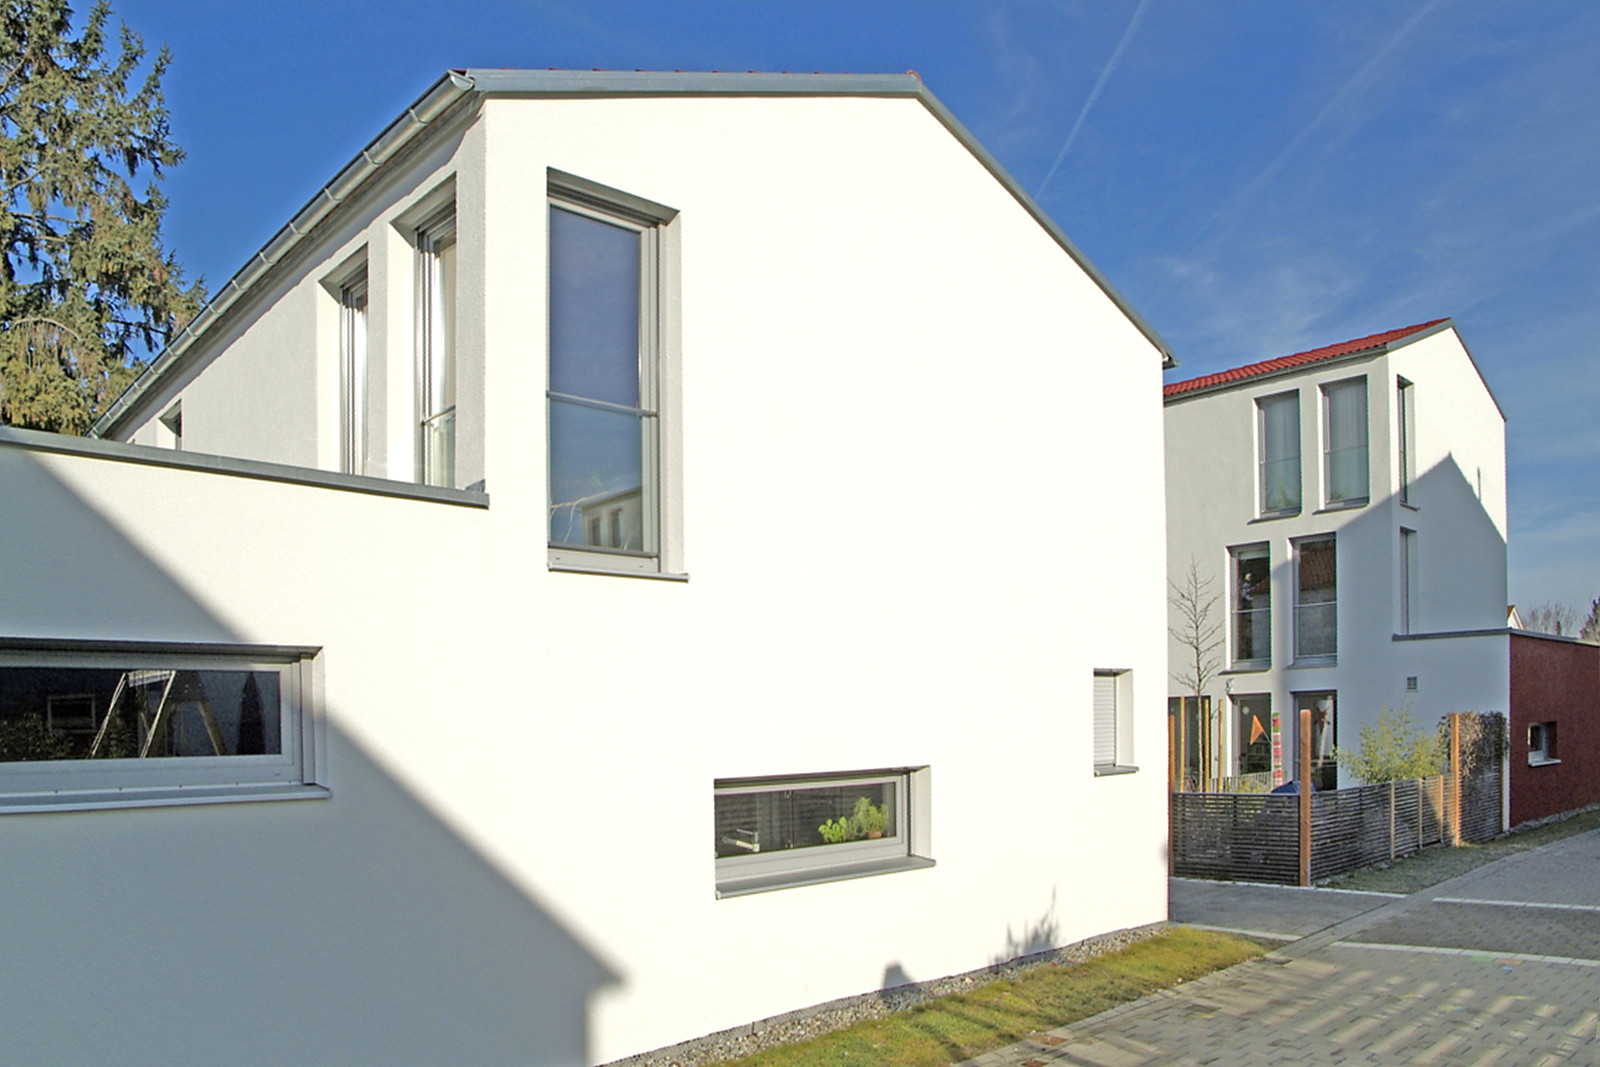 Gartenhofhaus